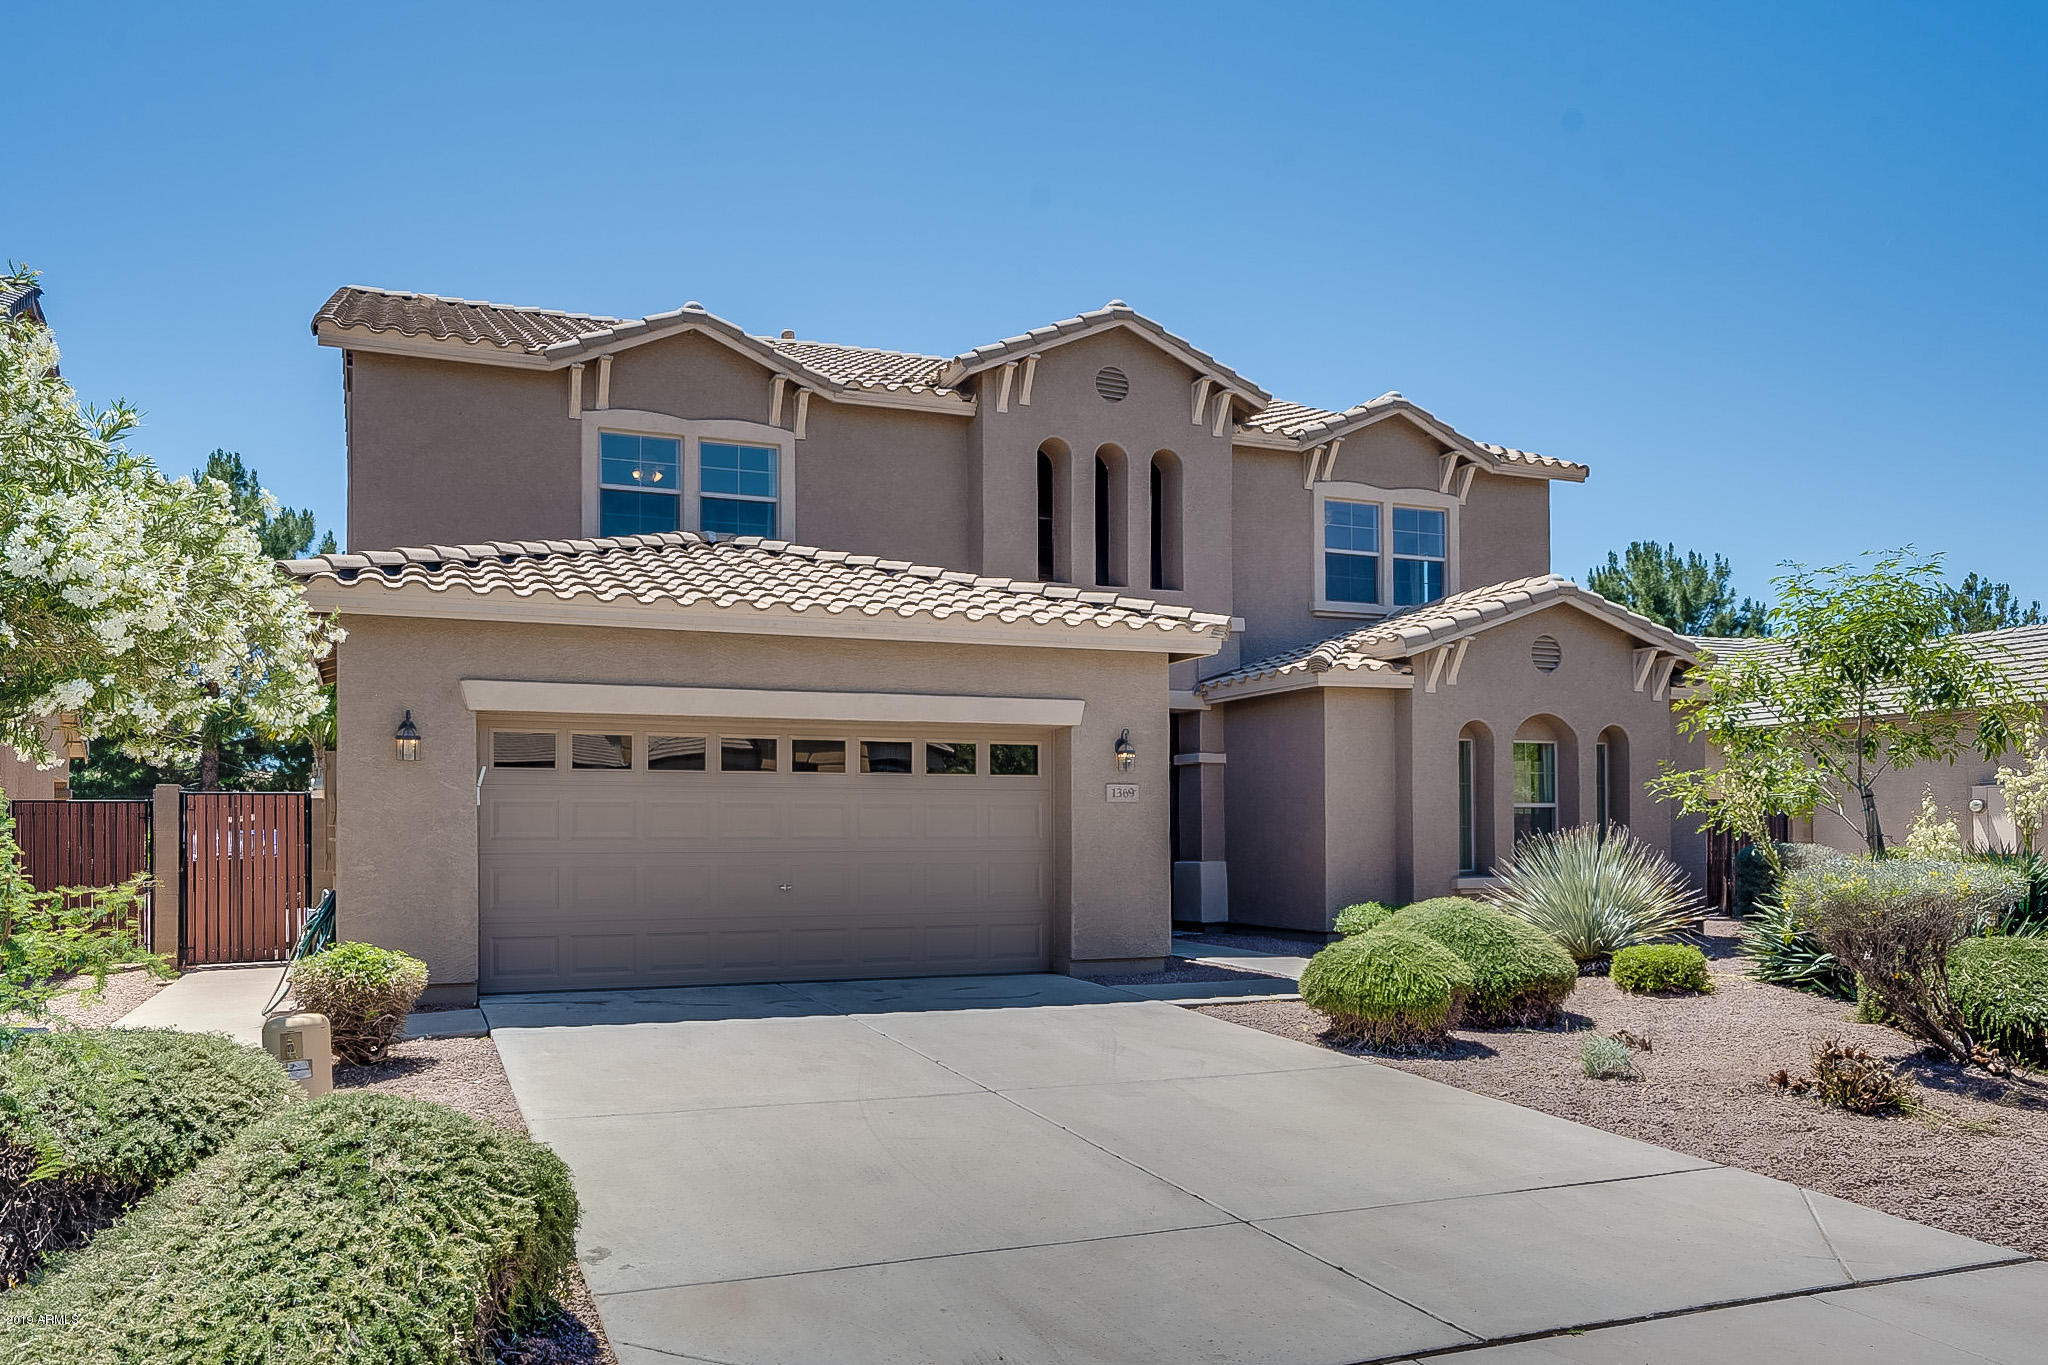 Photo of 1369 E CANYON CREEK Drive, Gilbert, AZ 85295